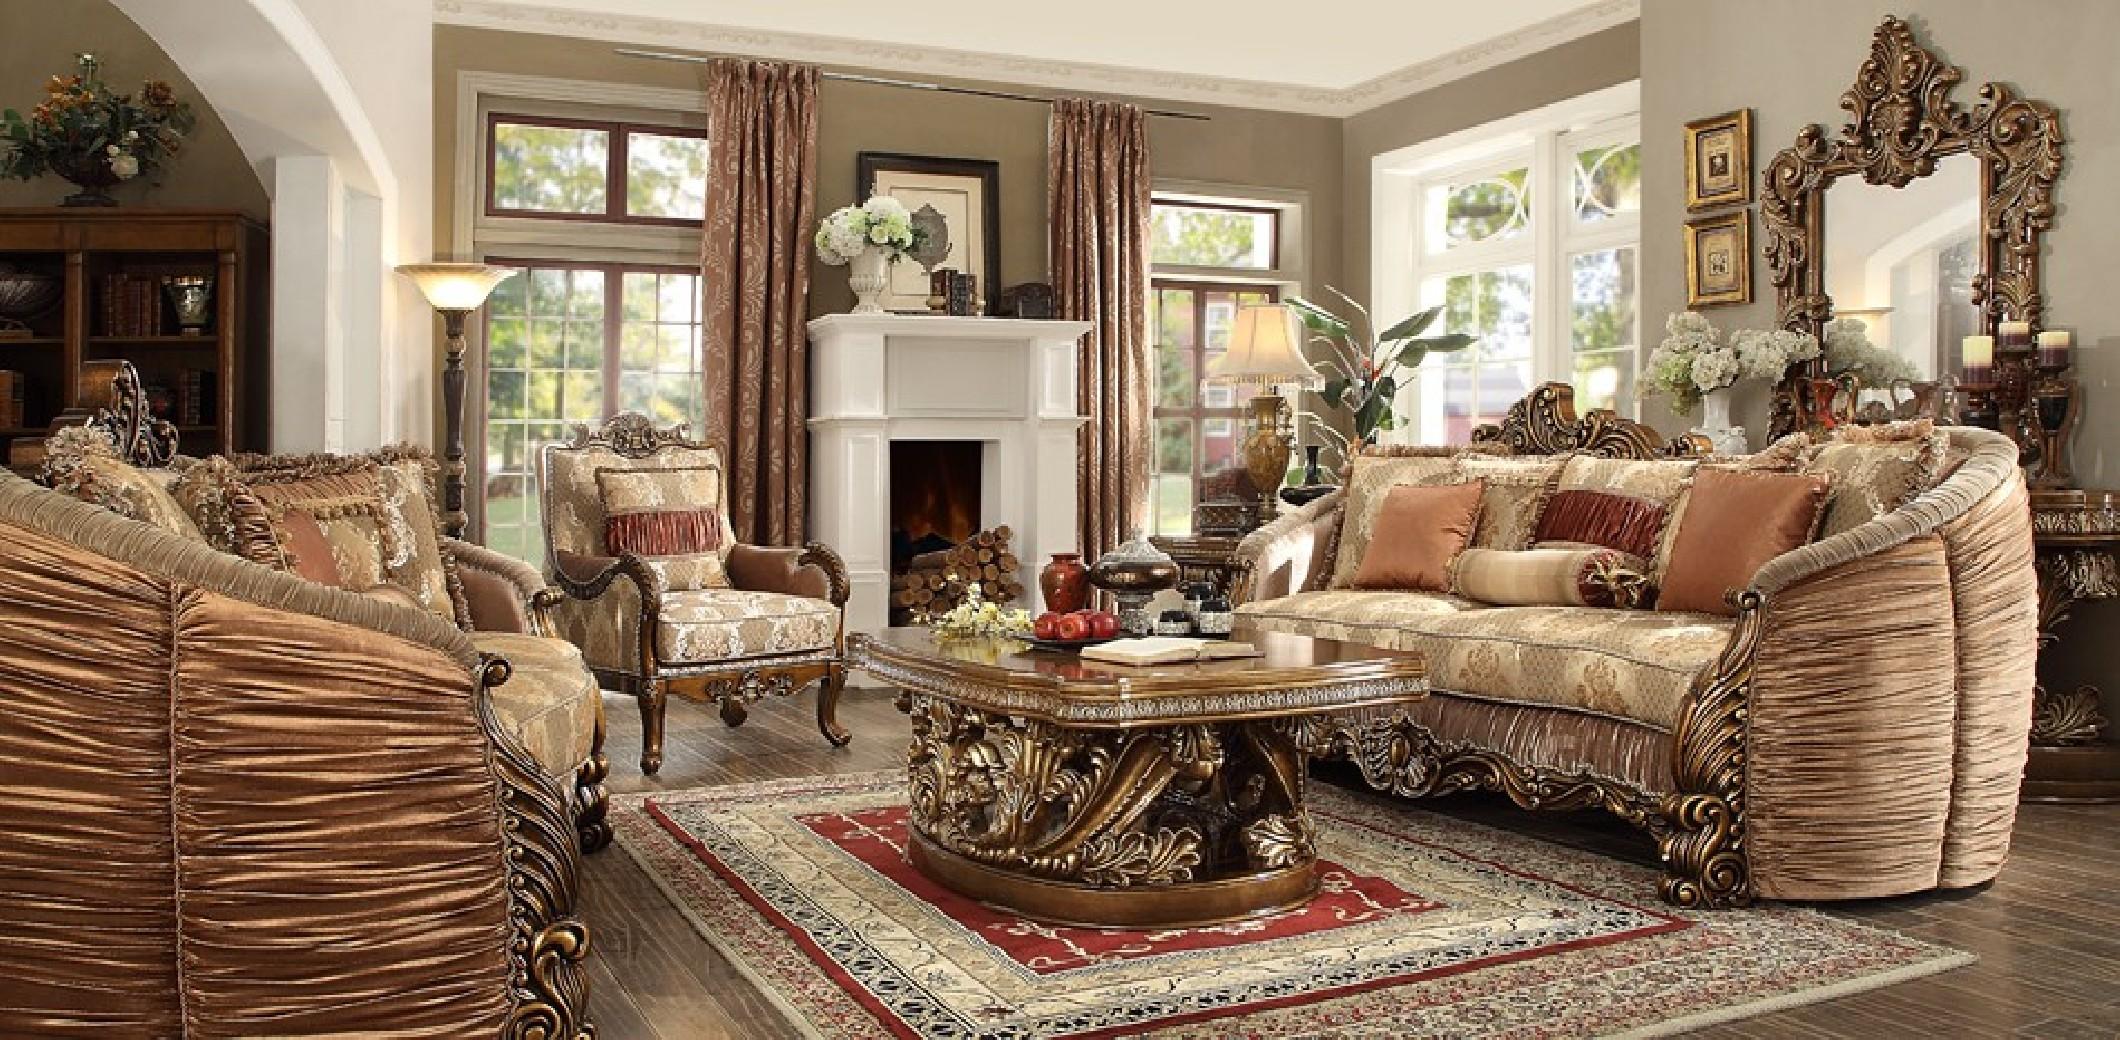 Hd 1601 Homey Design Upholstery Living Room Set Victorian European Classic Design Sofa Set